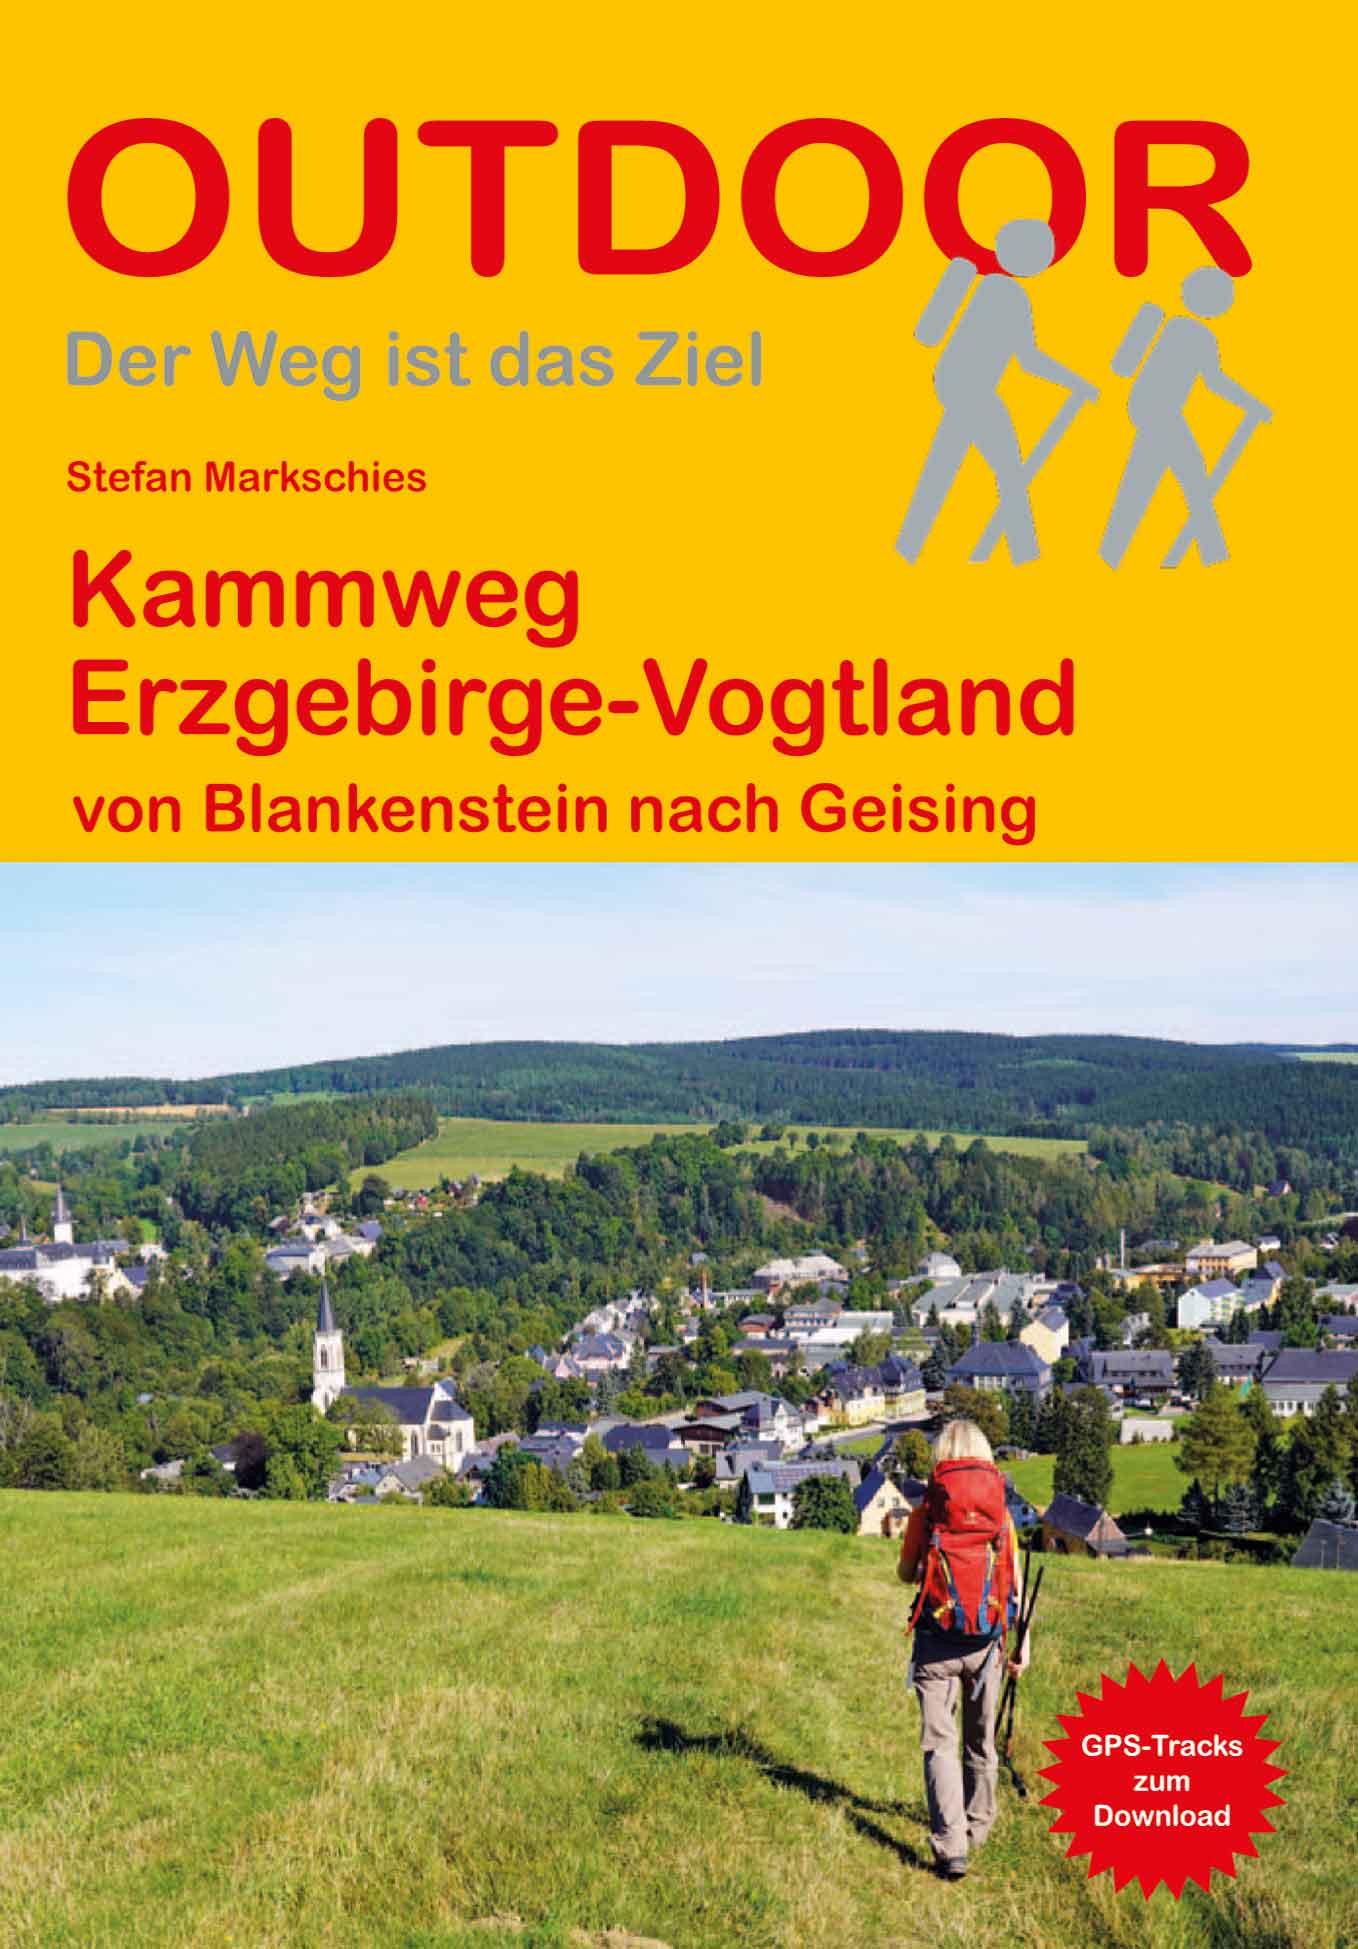 Kammweg Erzgebirge-Vogtland